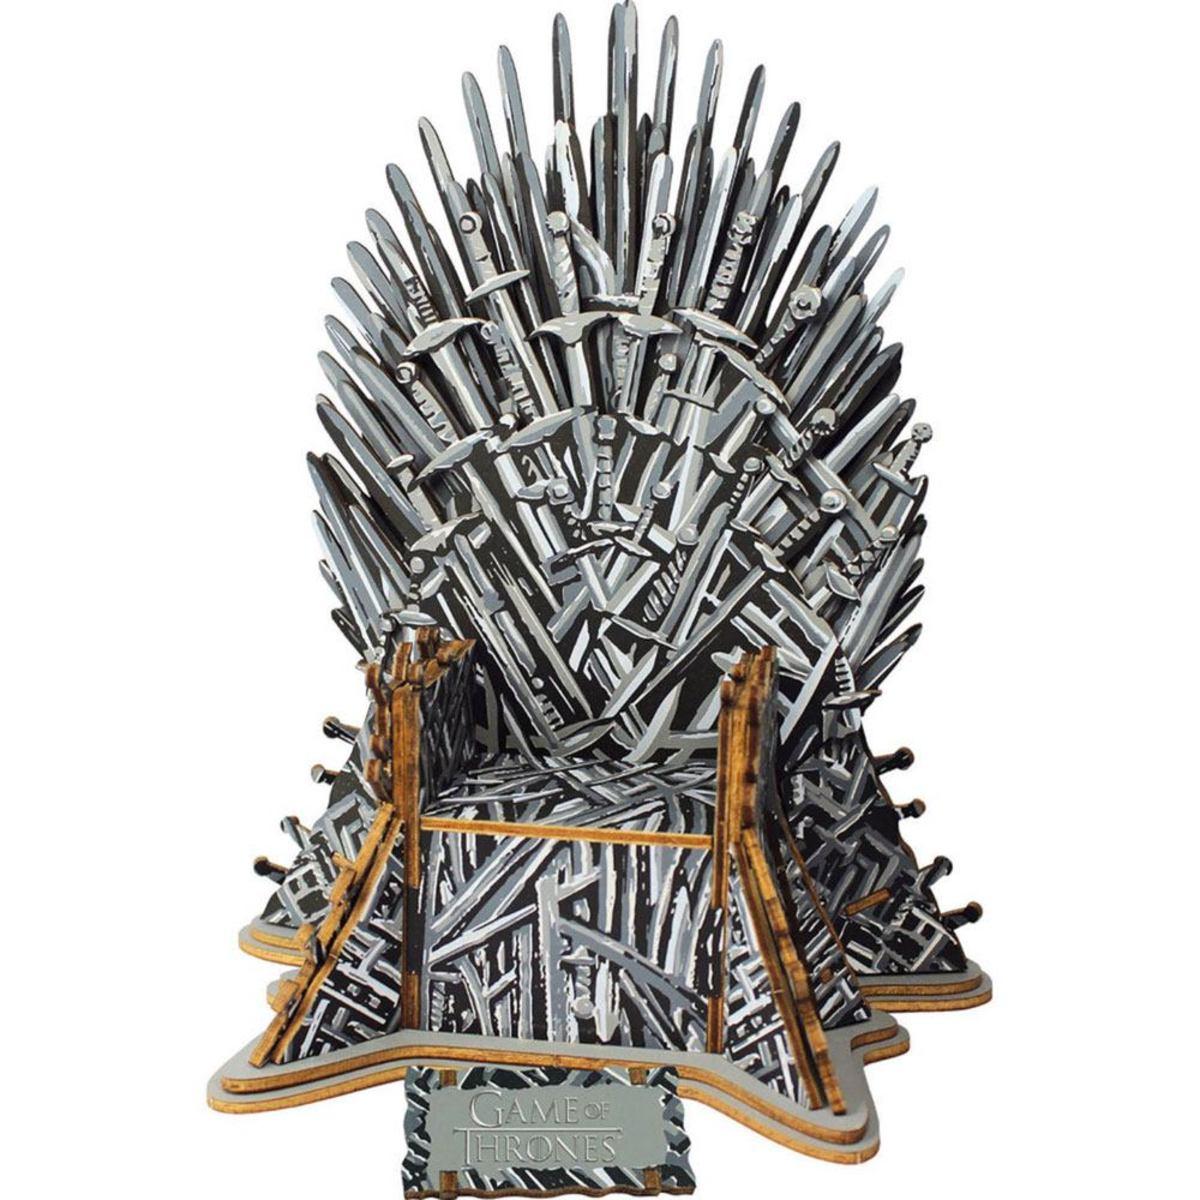 puzzle Game of Thrones (&&string1&&) - 3D Monument - Iron Throne - EDCA17207